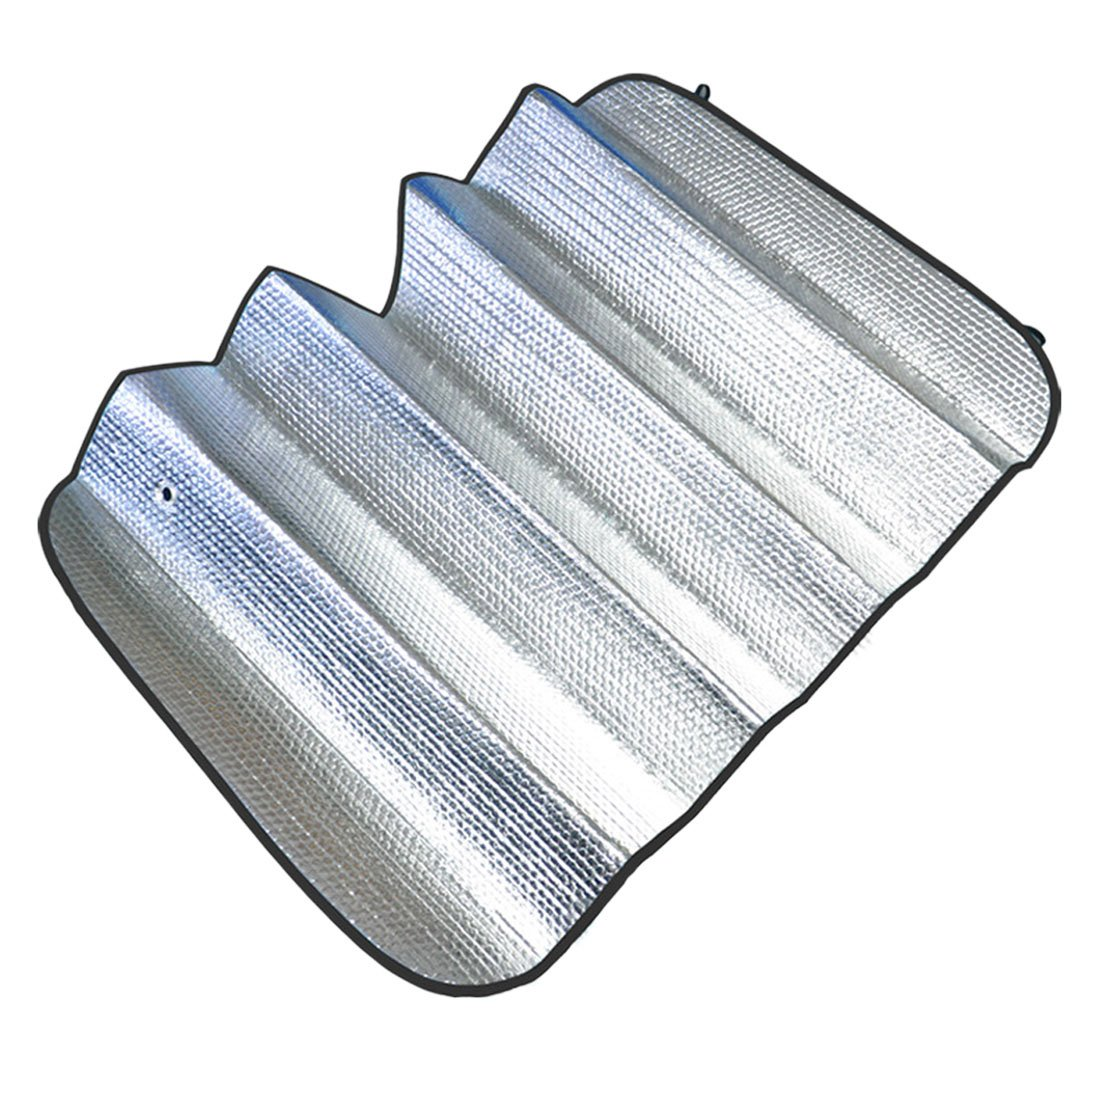 Handlife 2015 Car sun Shade, 140 X 70cm Double-sided Silver,bubble Cotton Sun Insulation HL-CL1051